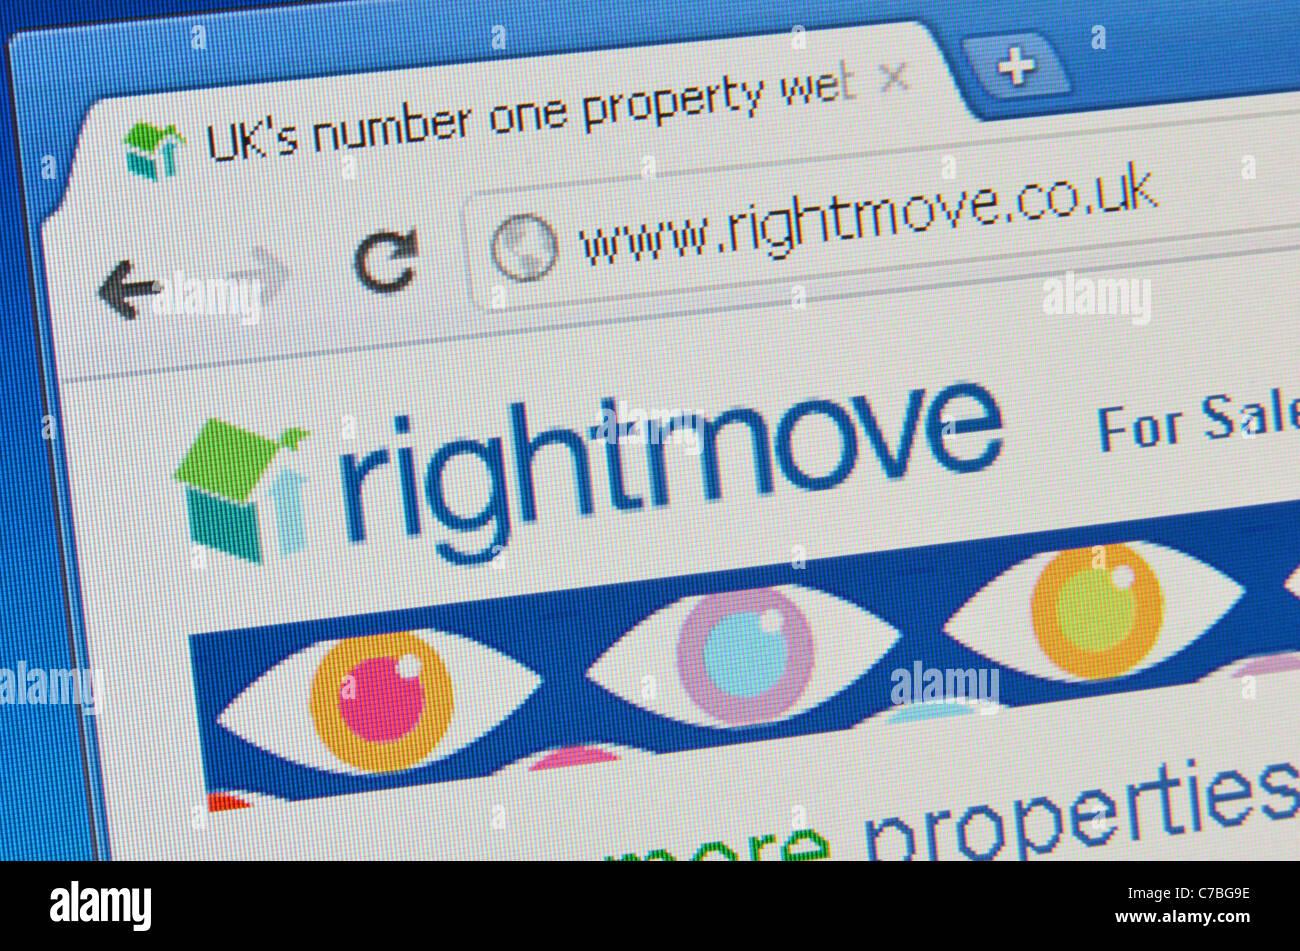 Rightmove website screenshot - Stock Image